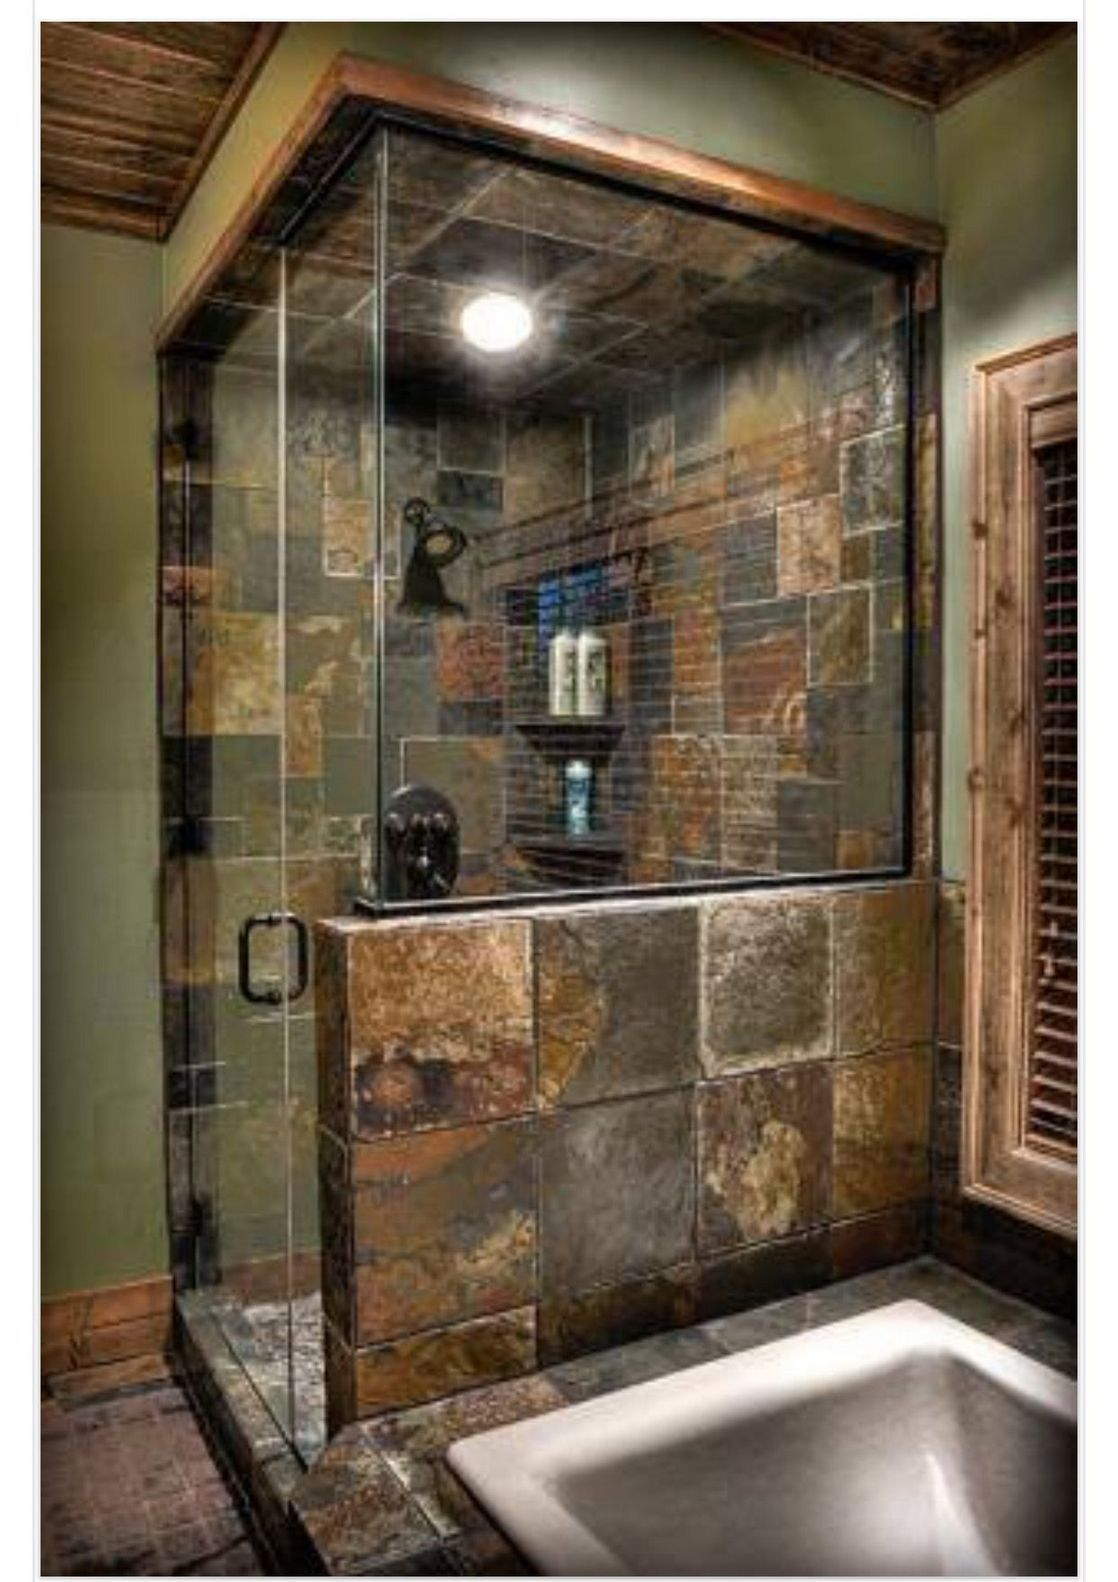 Photo of 30 rustic bathroom design ideas click more detail | Inspira Spaces